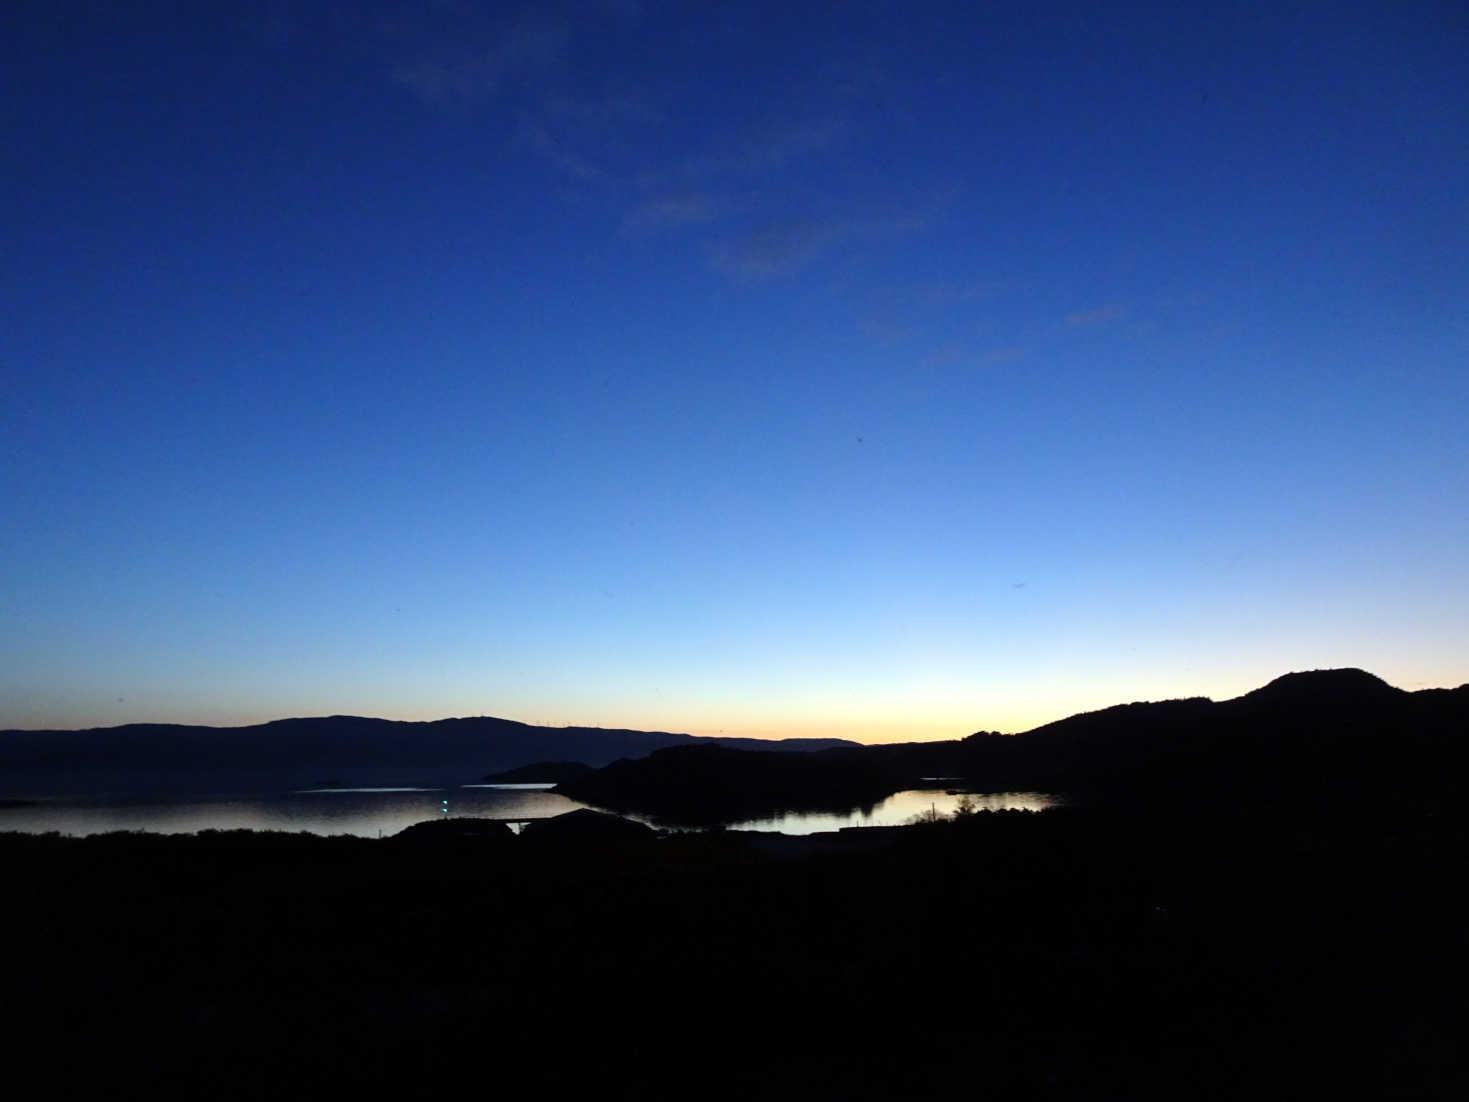 sunset day 3 over portavadie